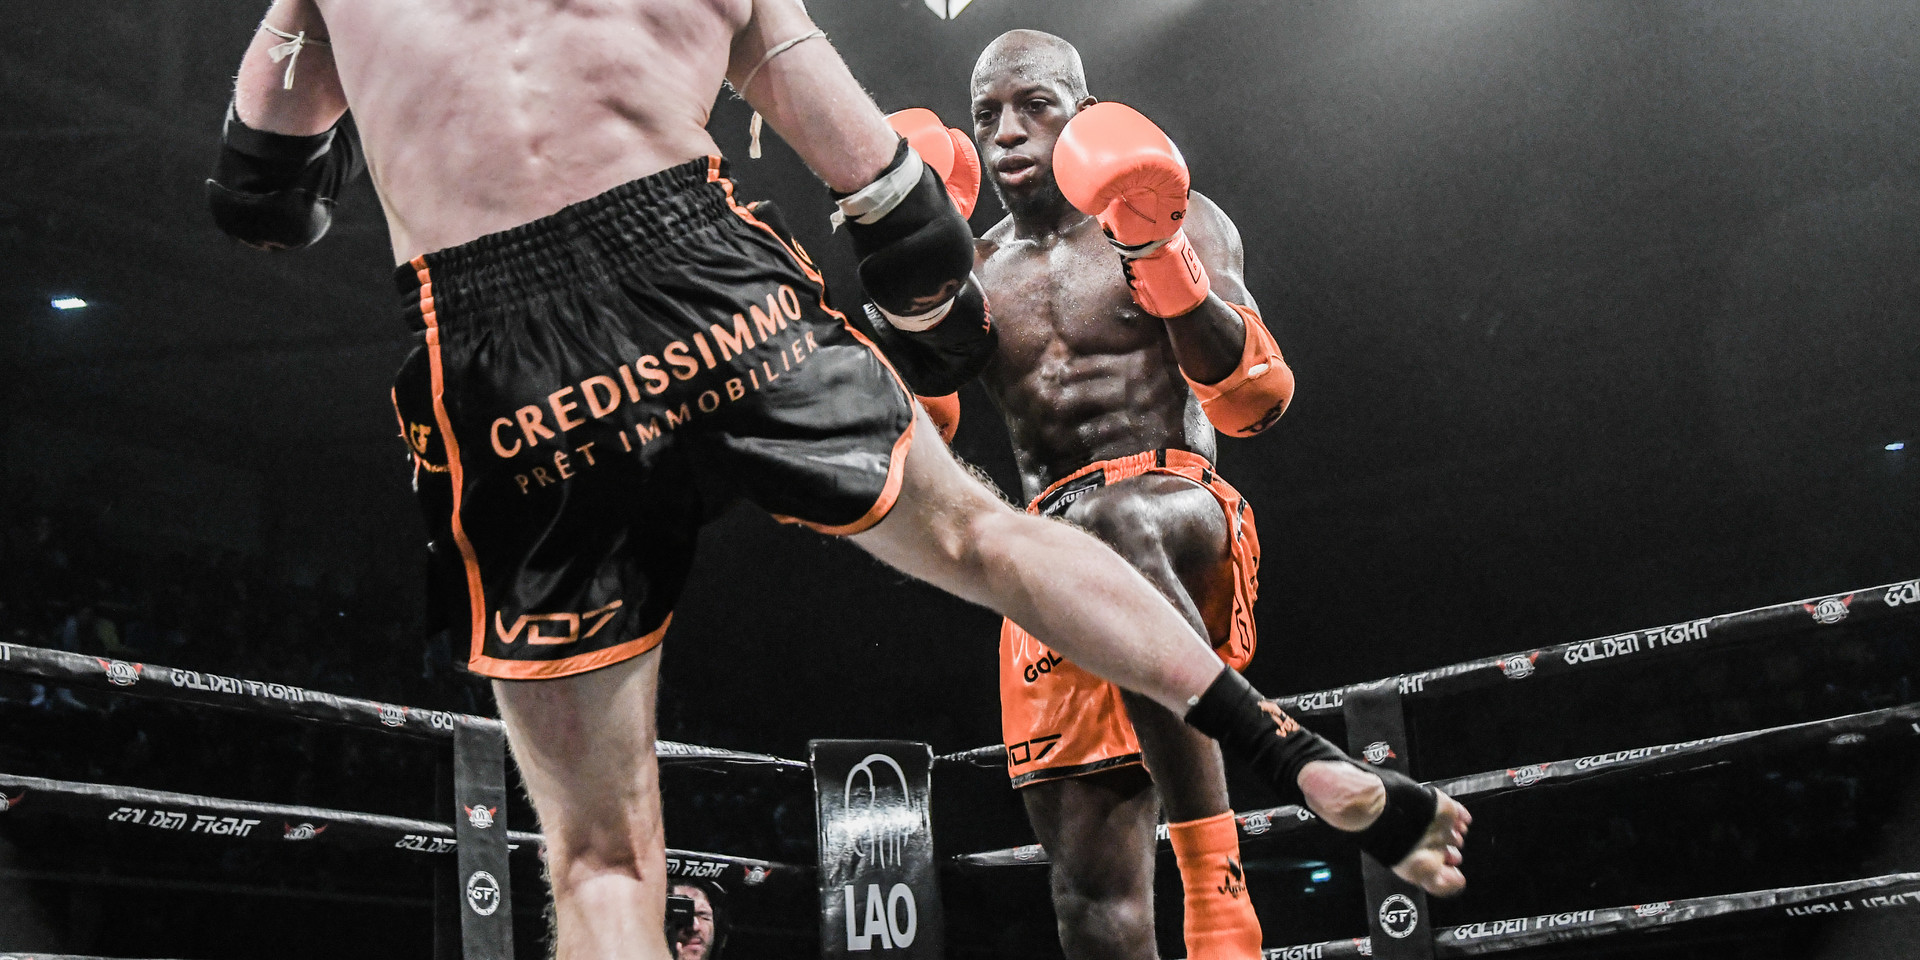 Kevin Renahy vs Mohamed Souane